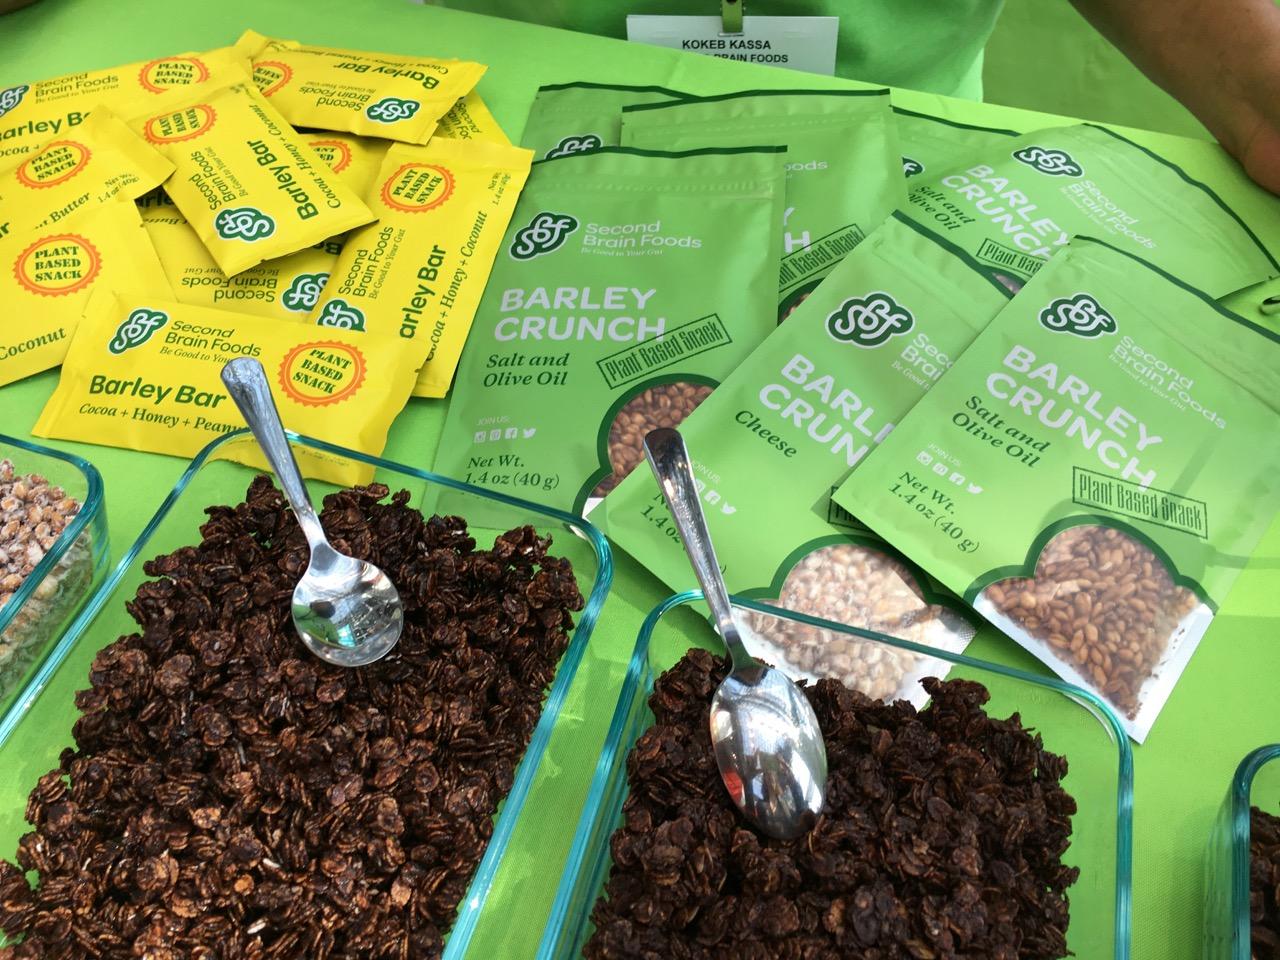 Second Brain Foods Barley Snacks